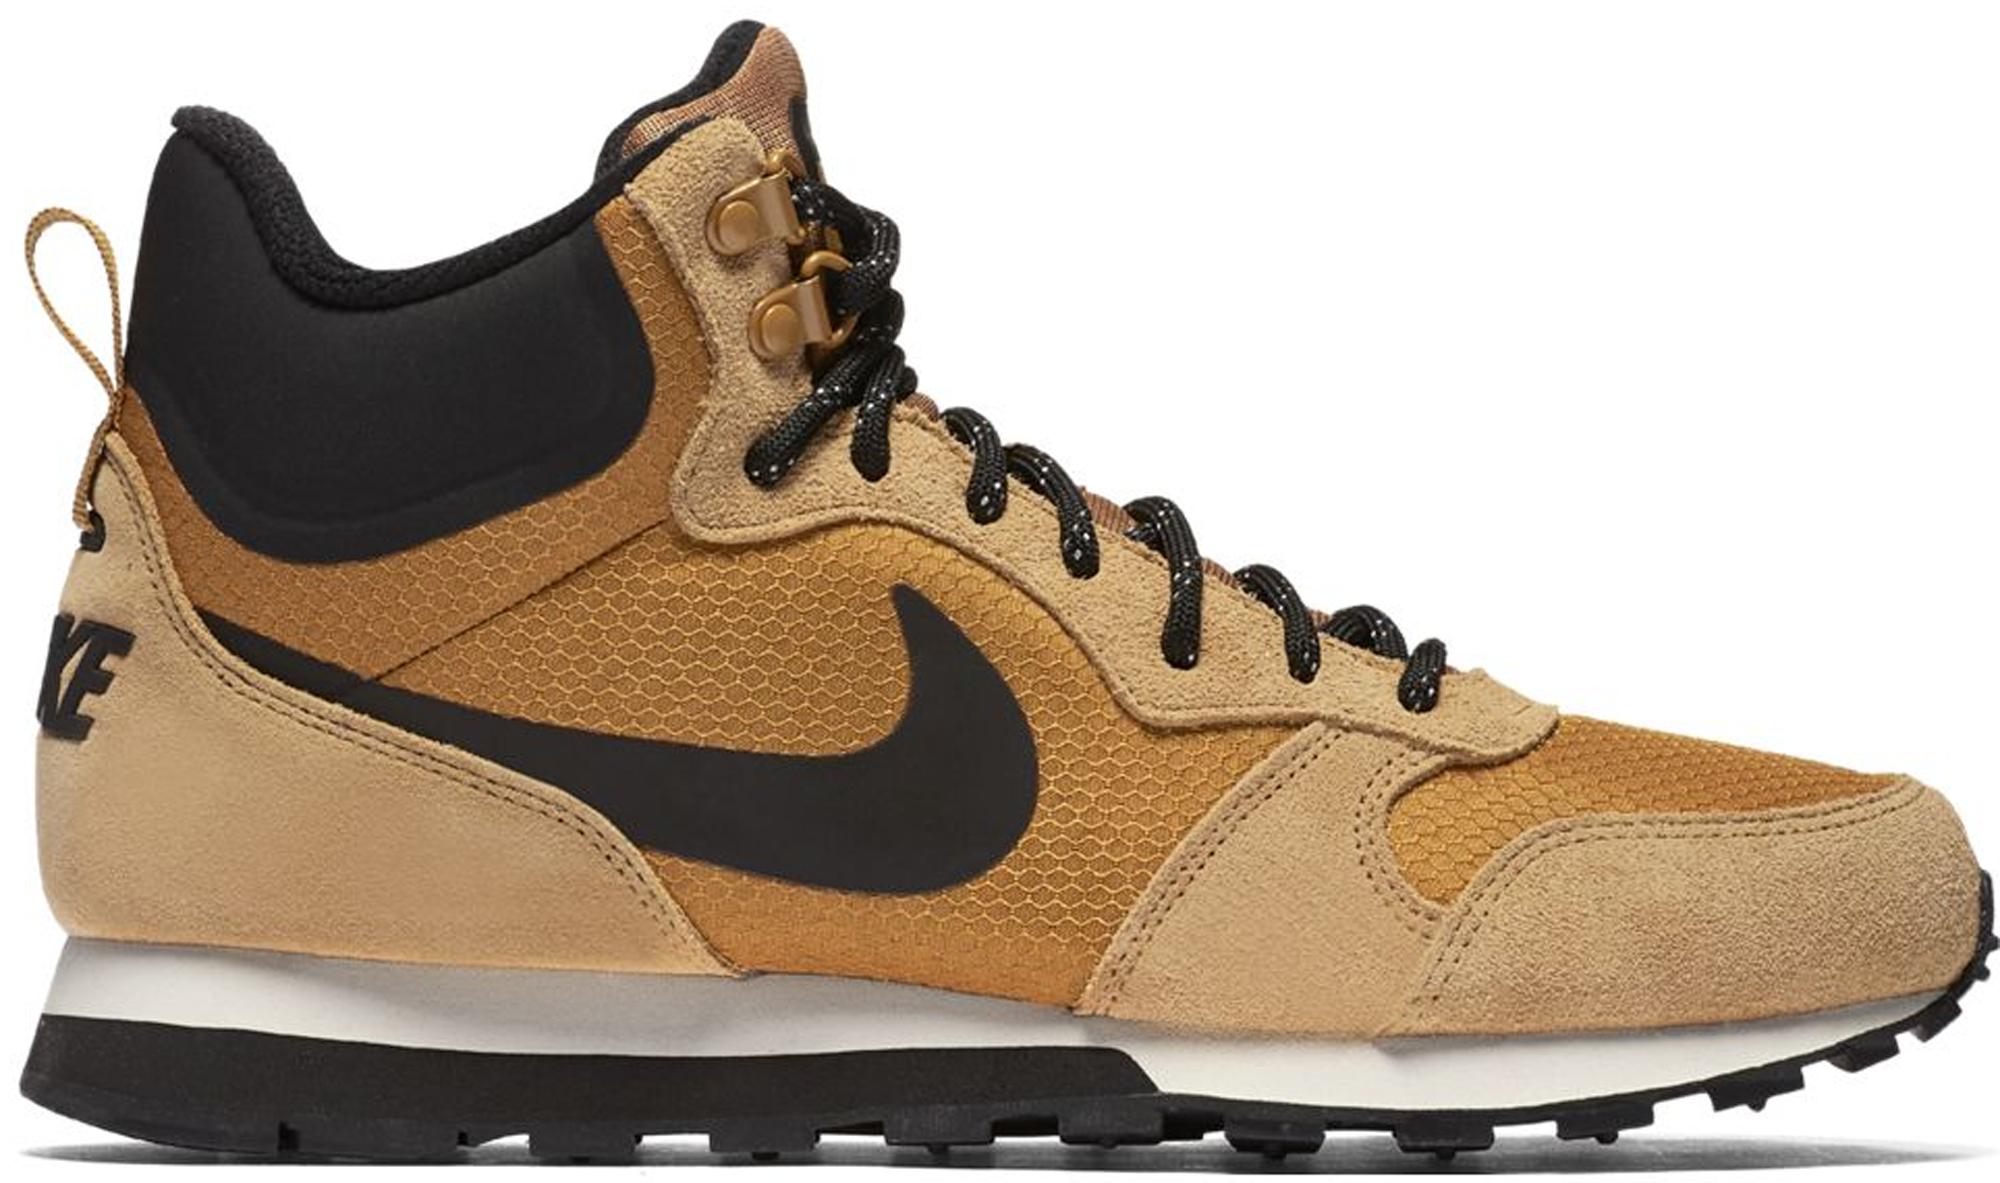 Nike MD Runner 2 Mid Wheat - 844864-701